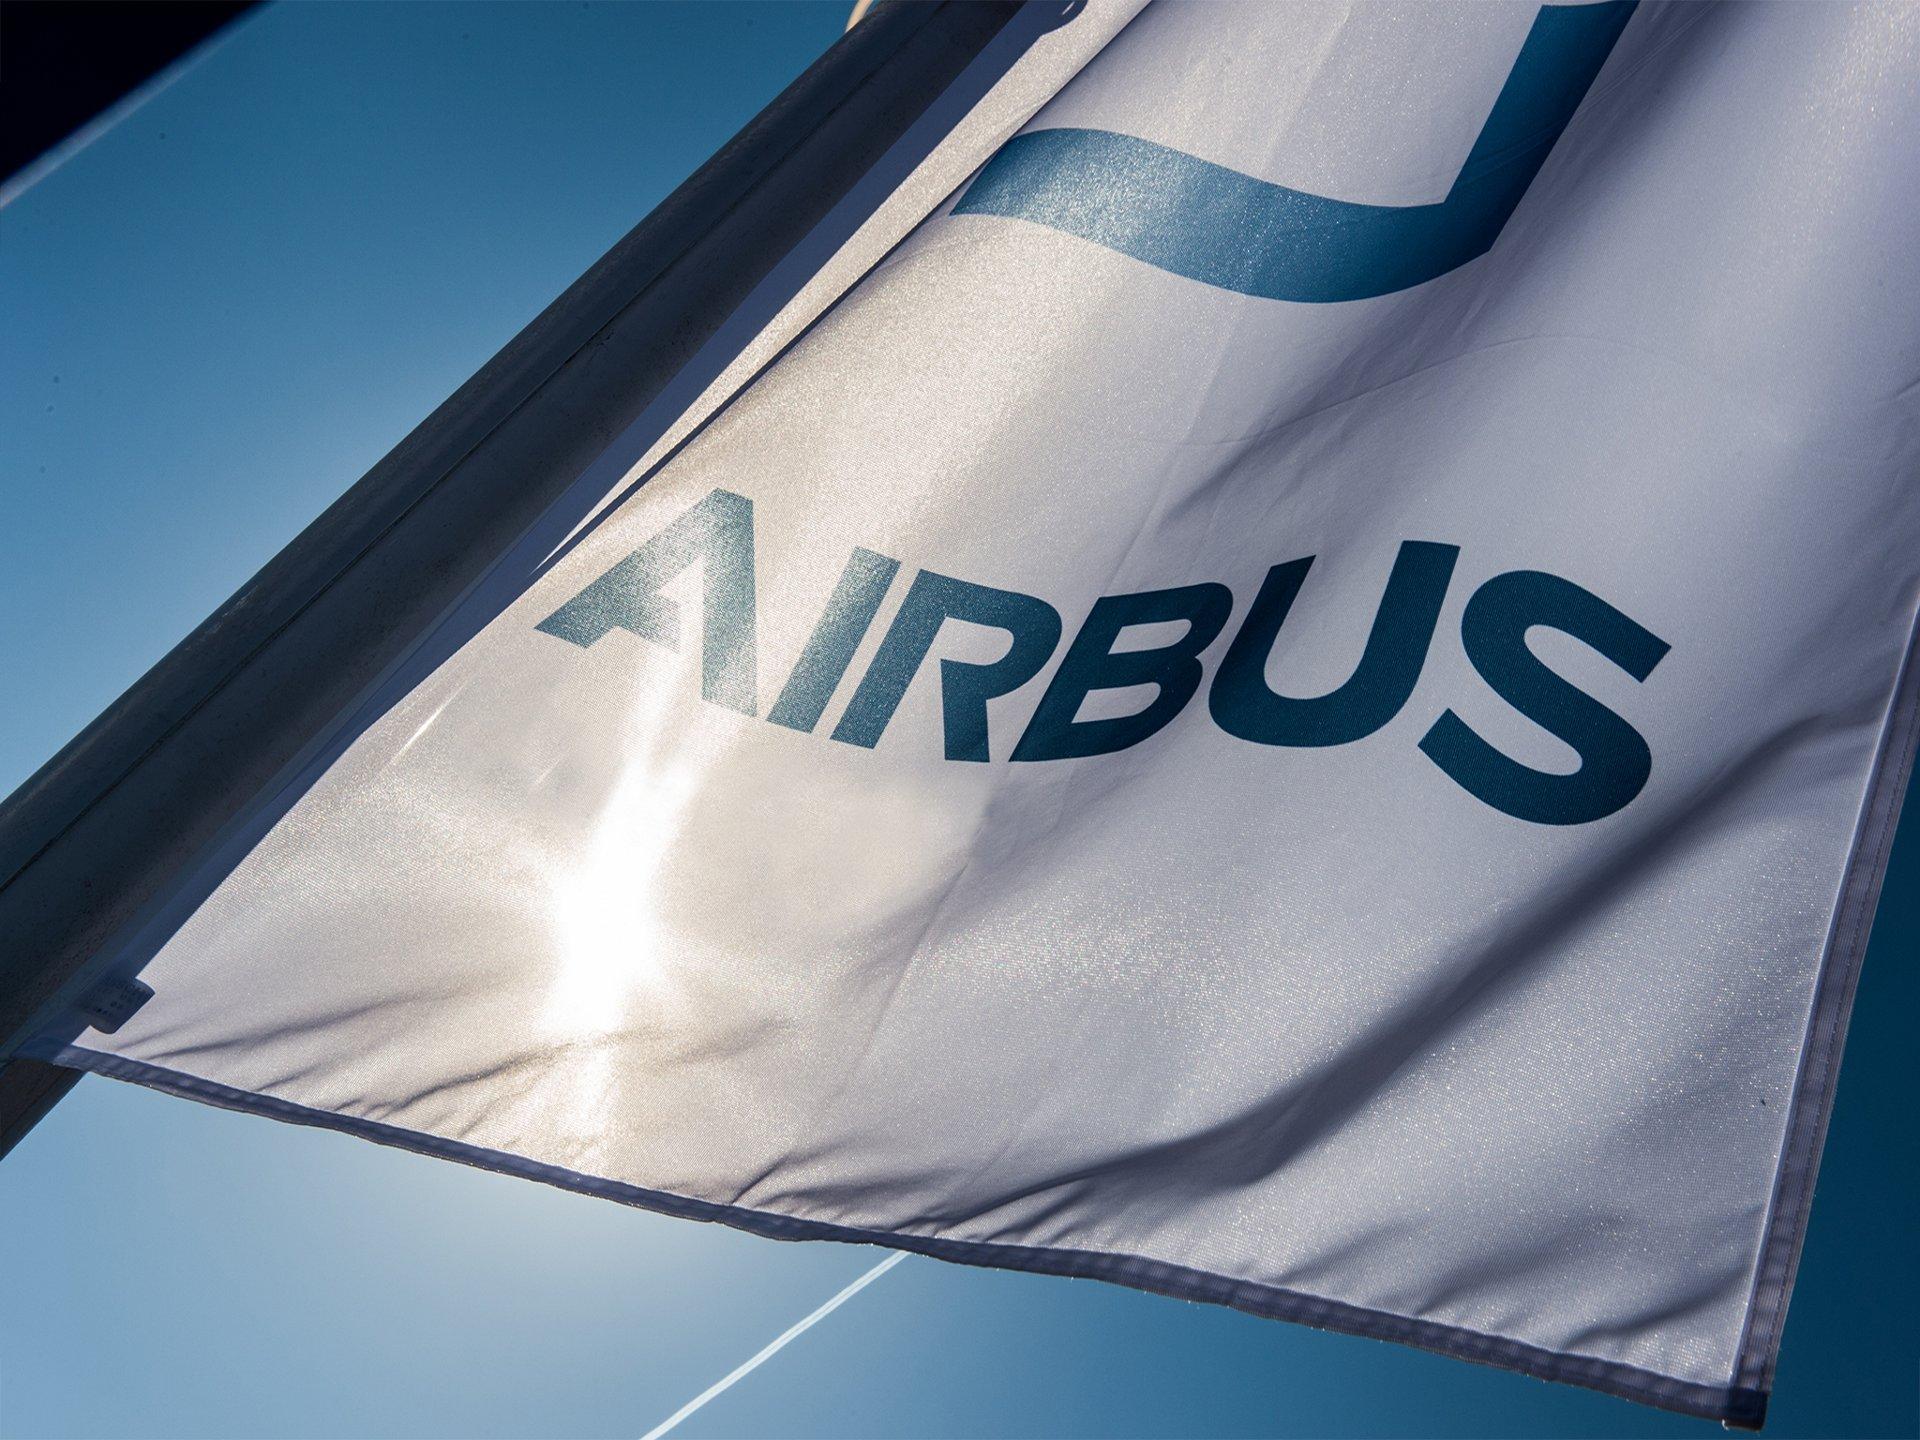 Résultats Financiers Airbus 2019